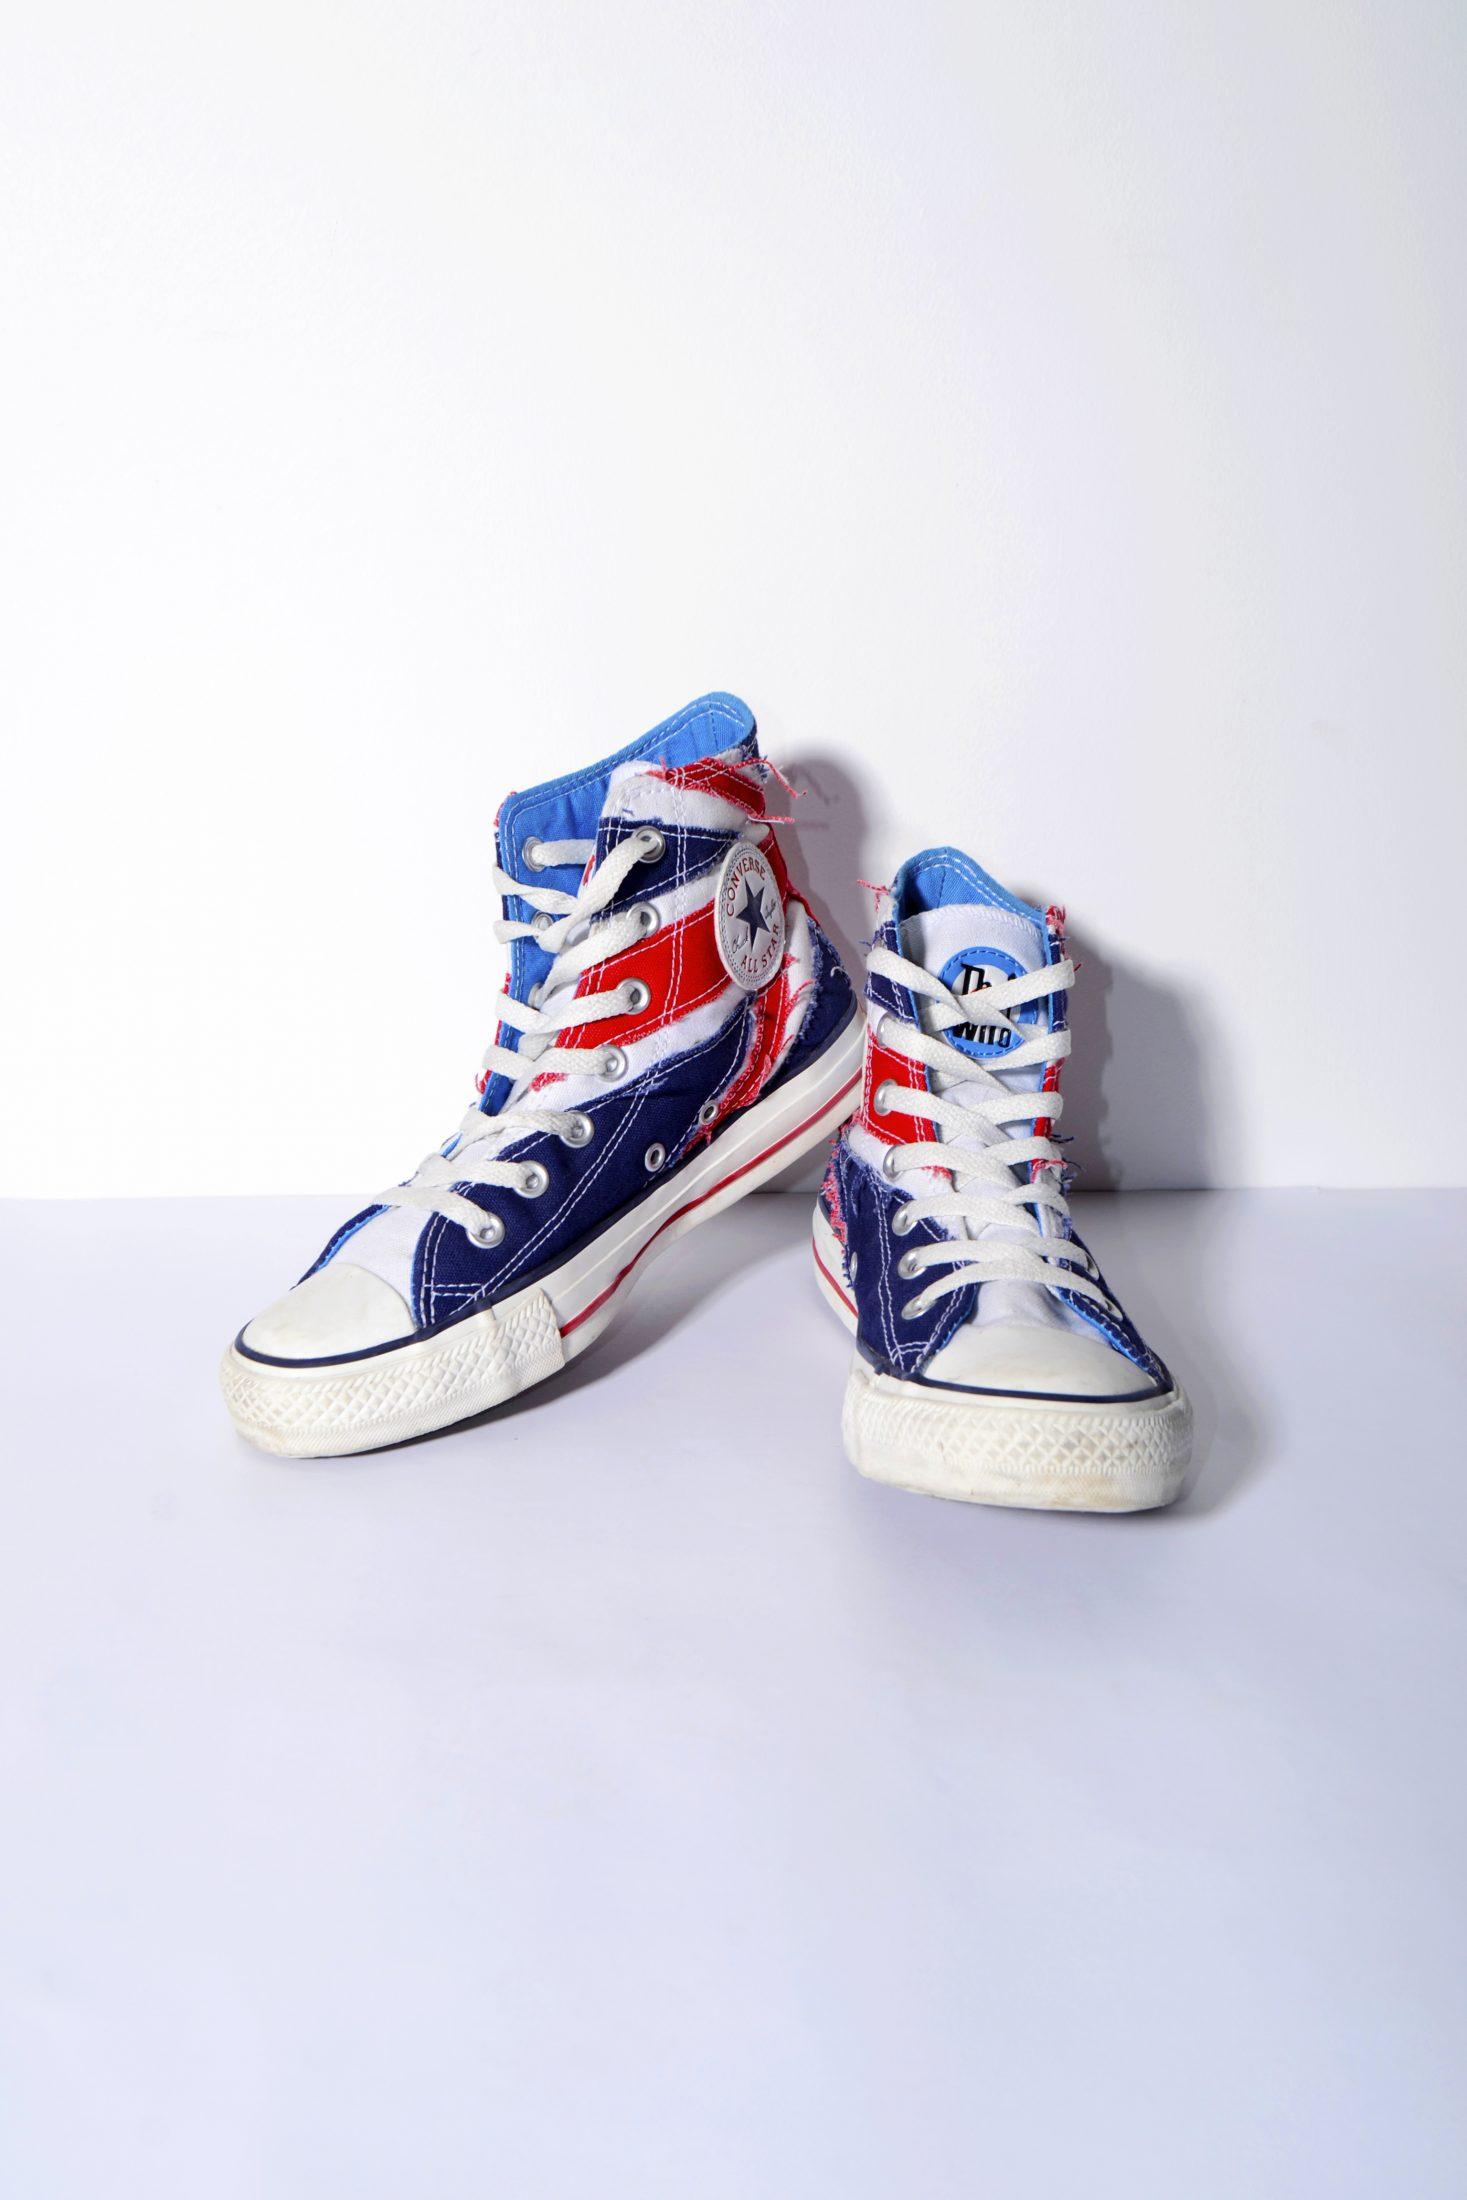 8bce49b29ad7f0 Converse uk flag women s sneaker Chuck Taylor All Star high top